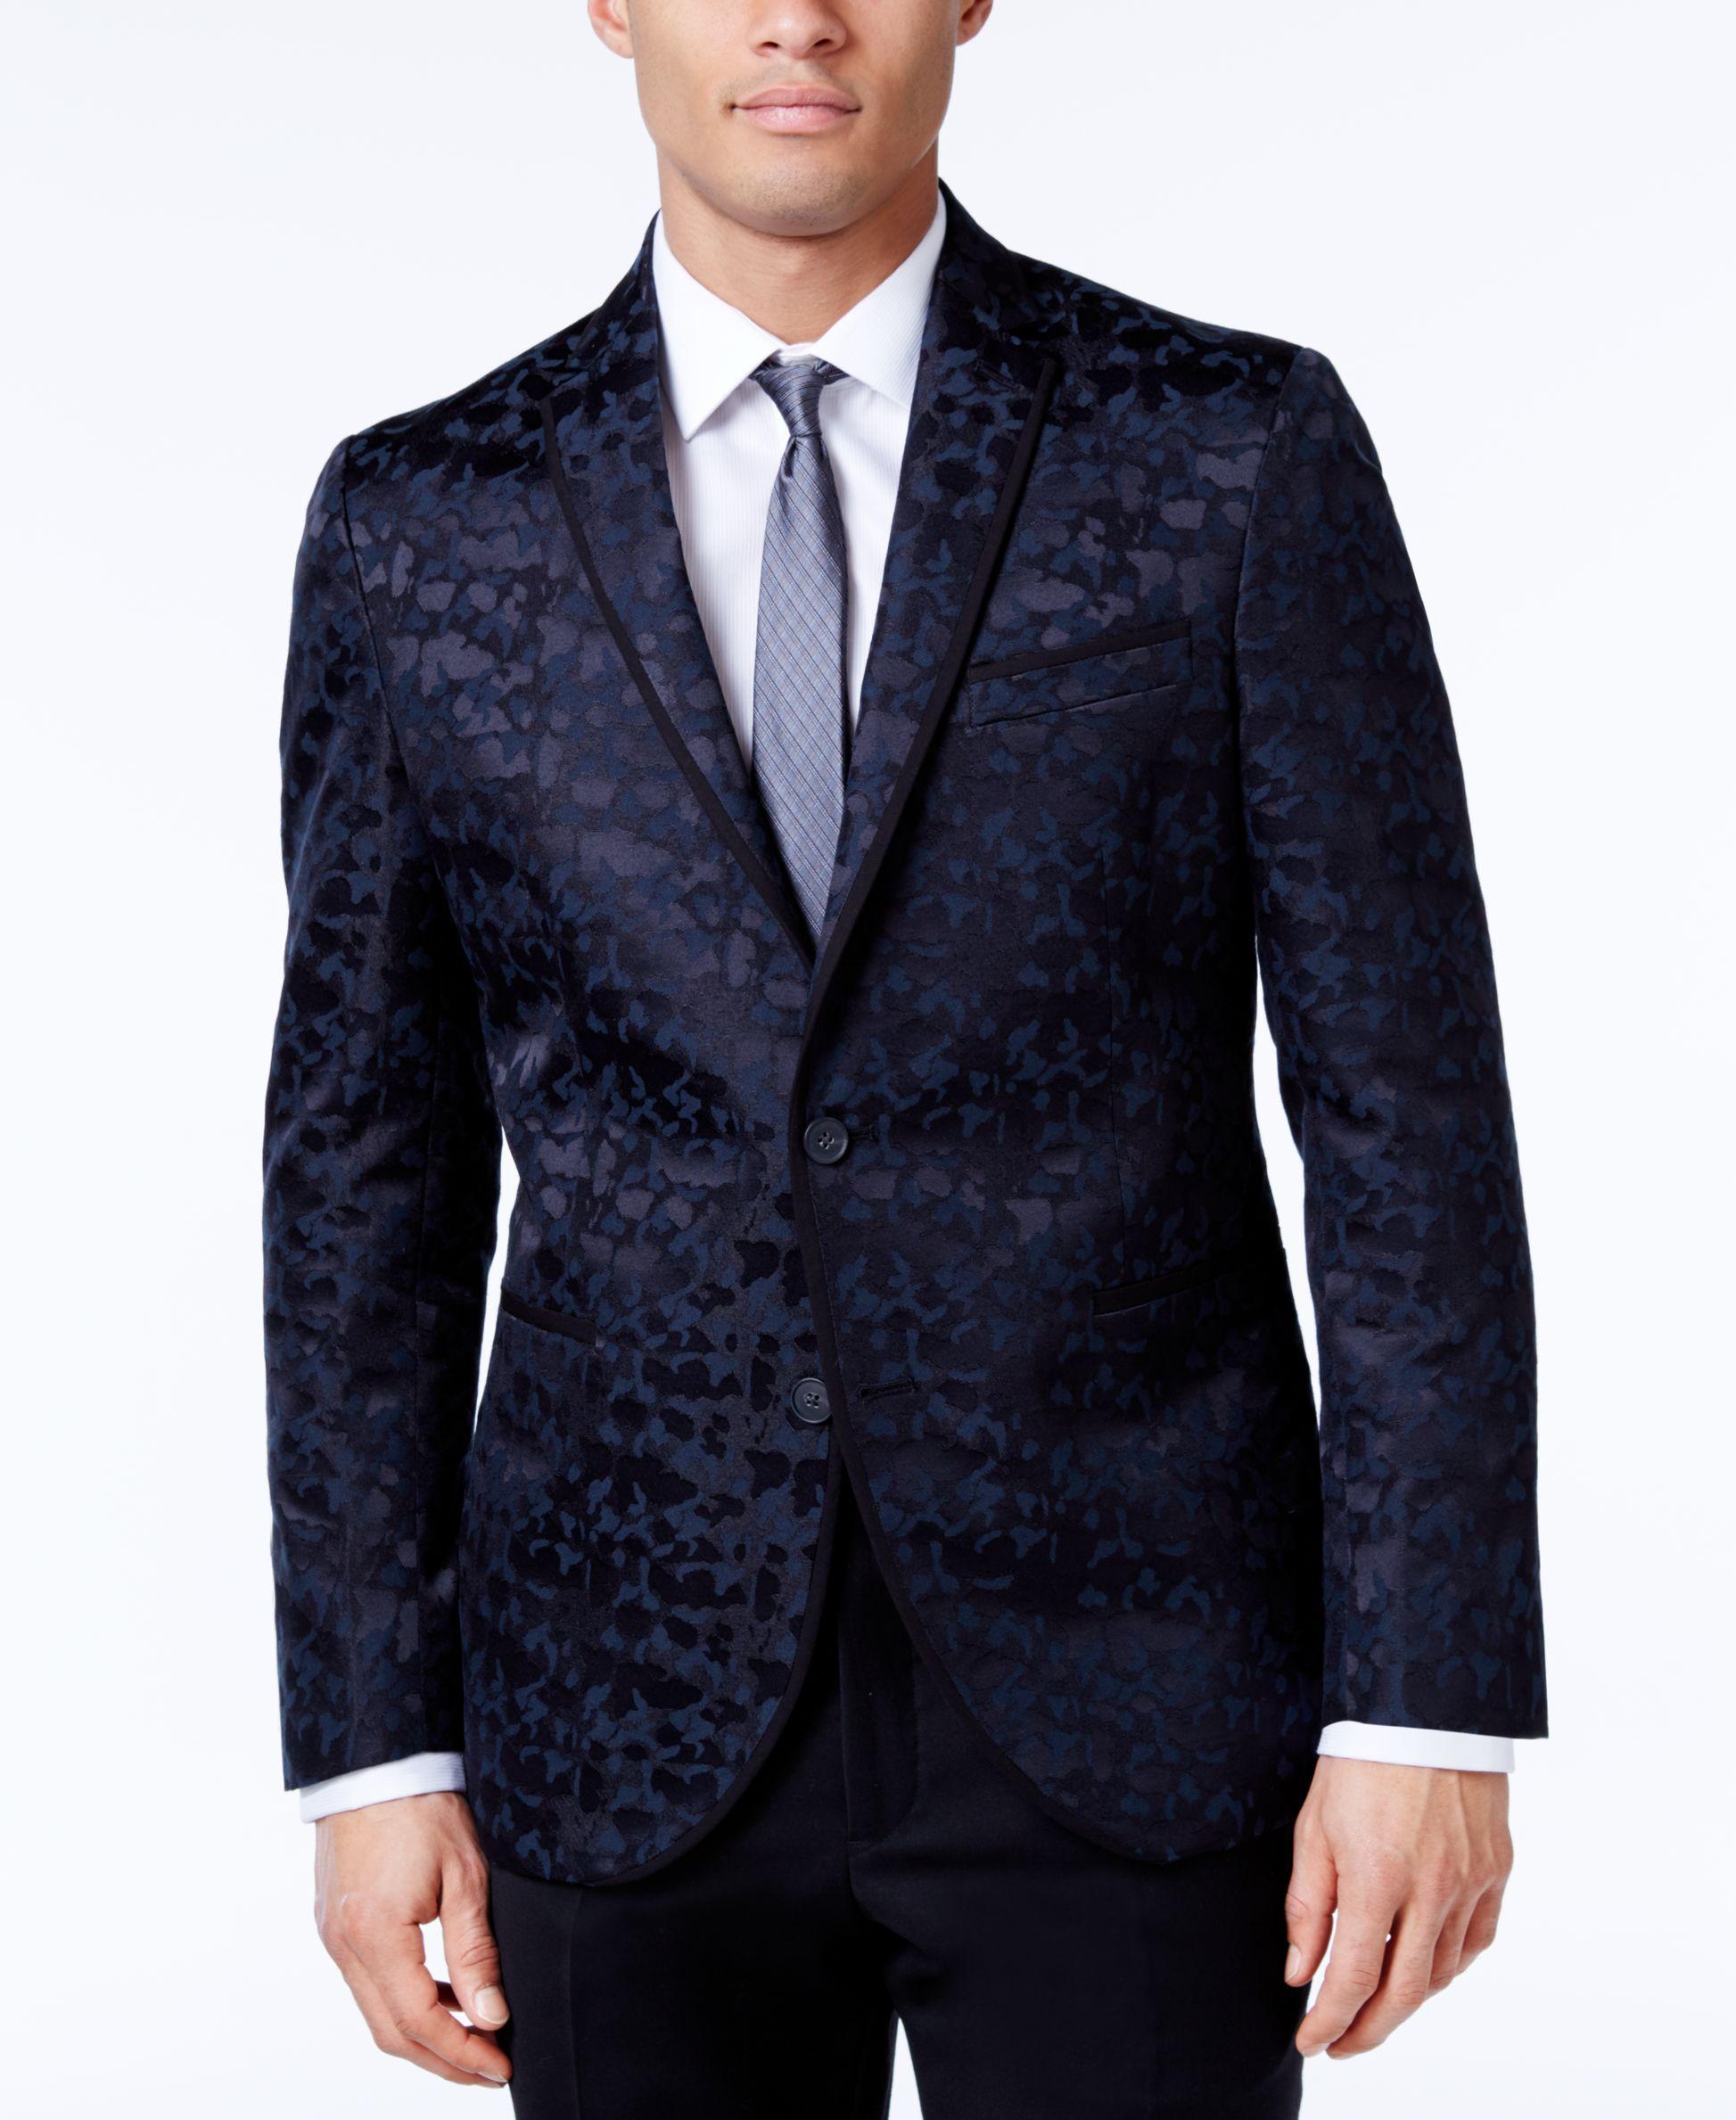 00e7c136ea436 Kenneth Cole Reaction Men's Slim-Fit Blue and Camouflage Dinner Jacket